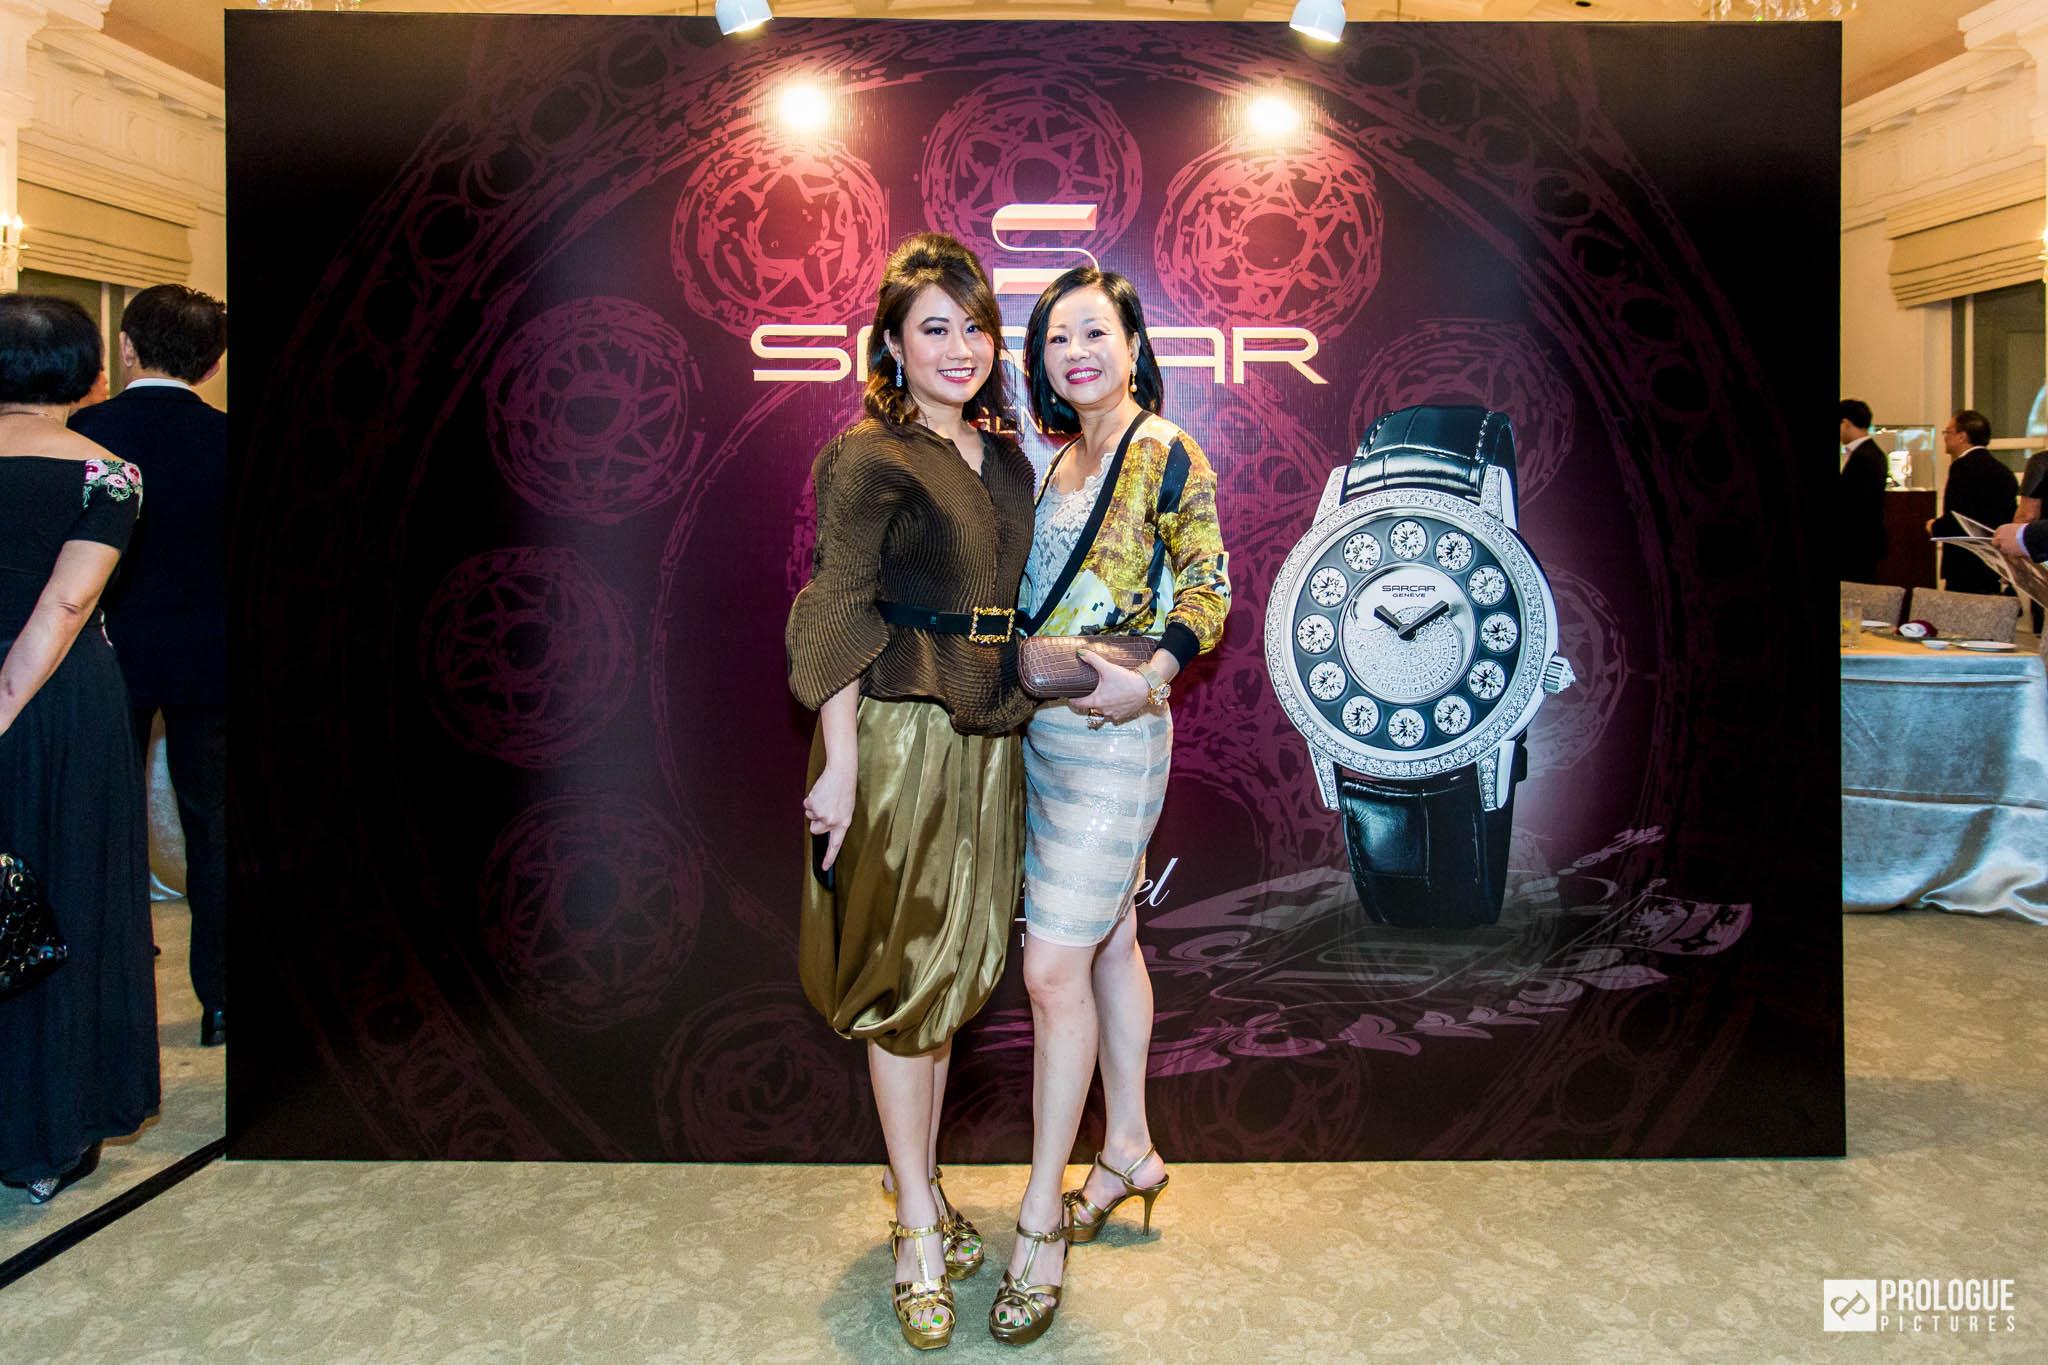 sarcar-le-carrousel-collection-event-photography-singapore-prologue-pictures-06